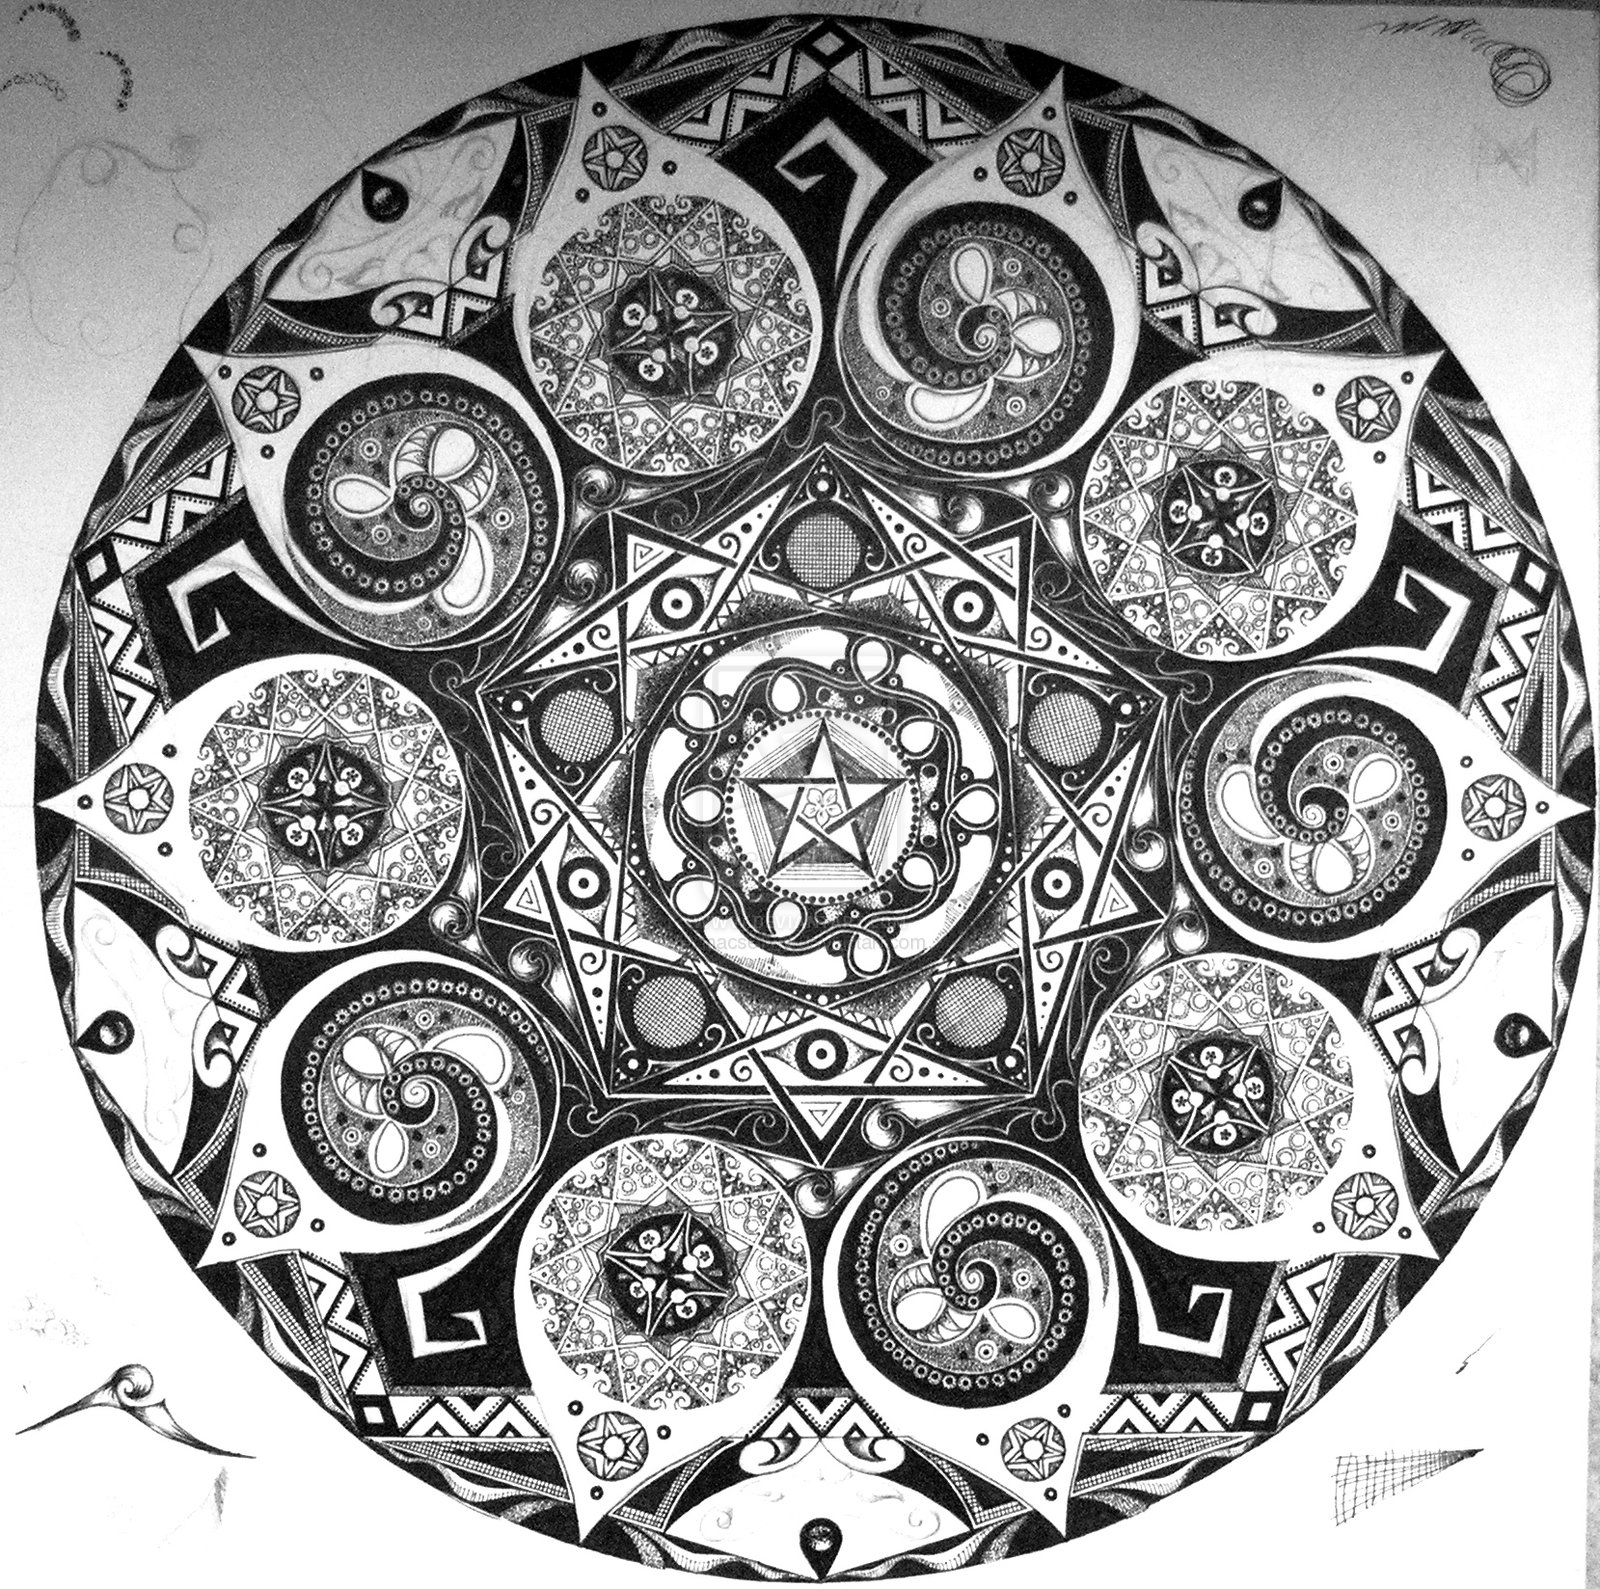 Mandala Wallpaper Black And White Xth mandala in prog by Mandala 1600x1589